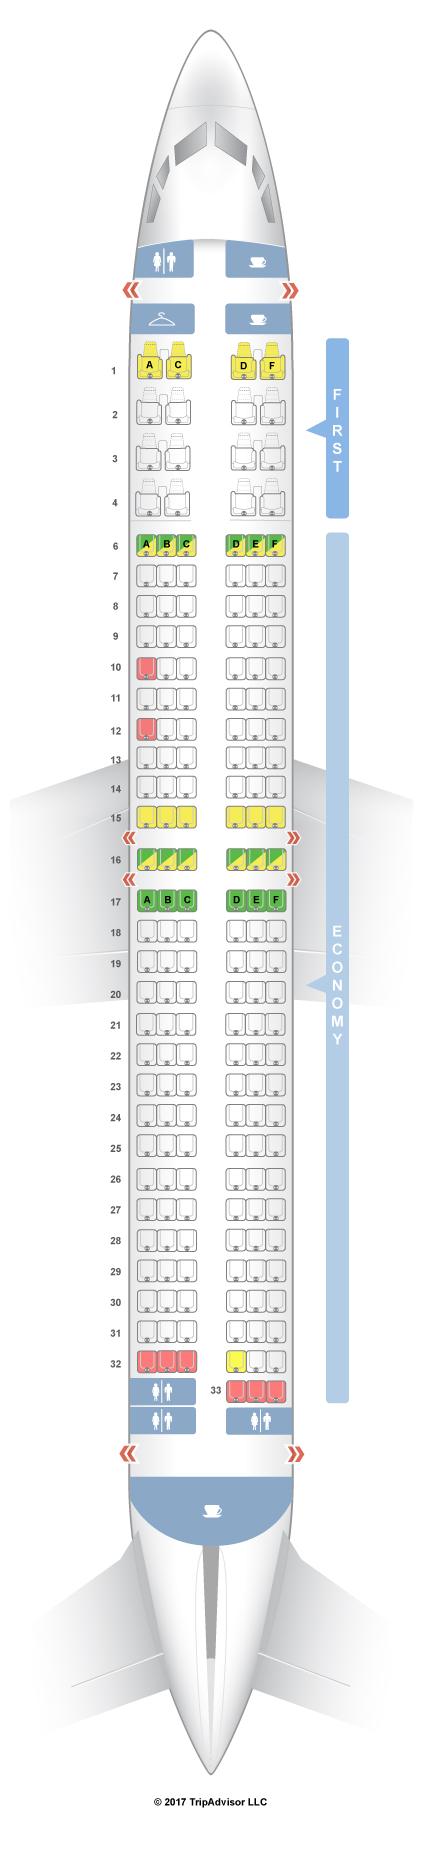 Seatguru seat map alaska airlines boeing 737 900 739 v1